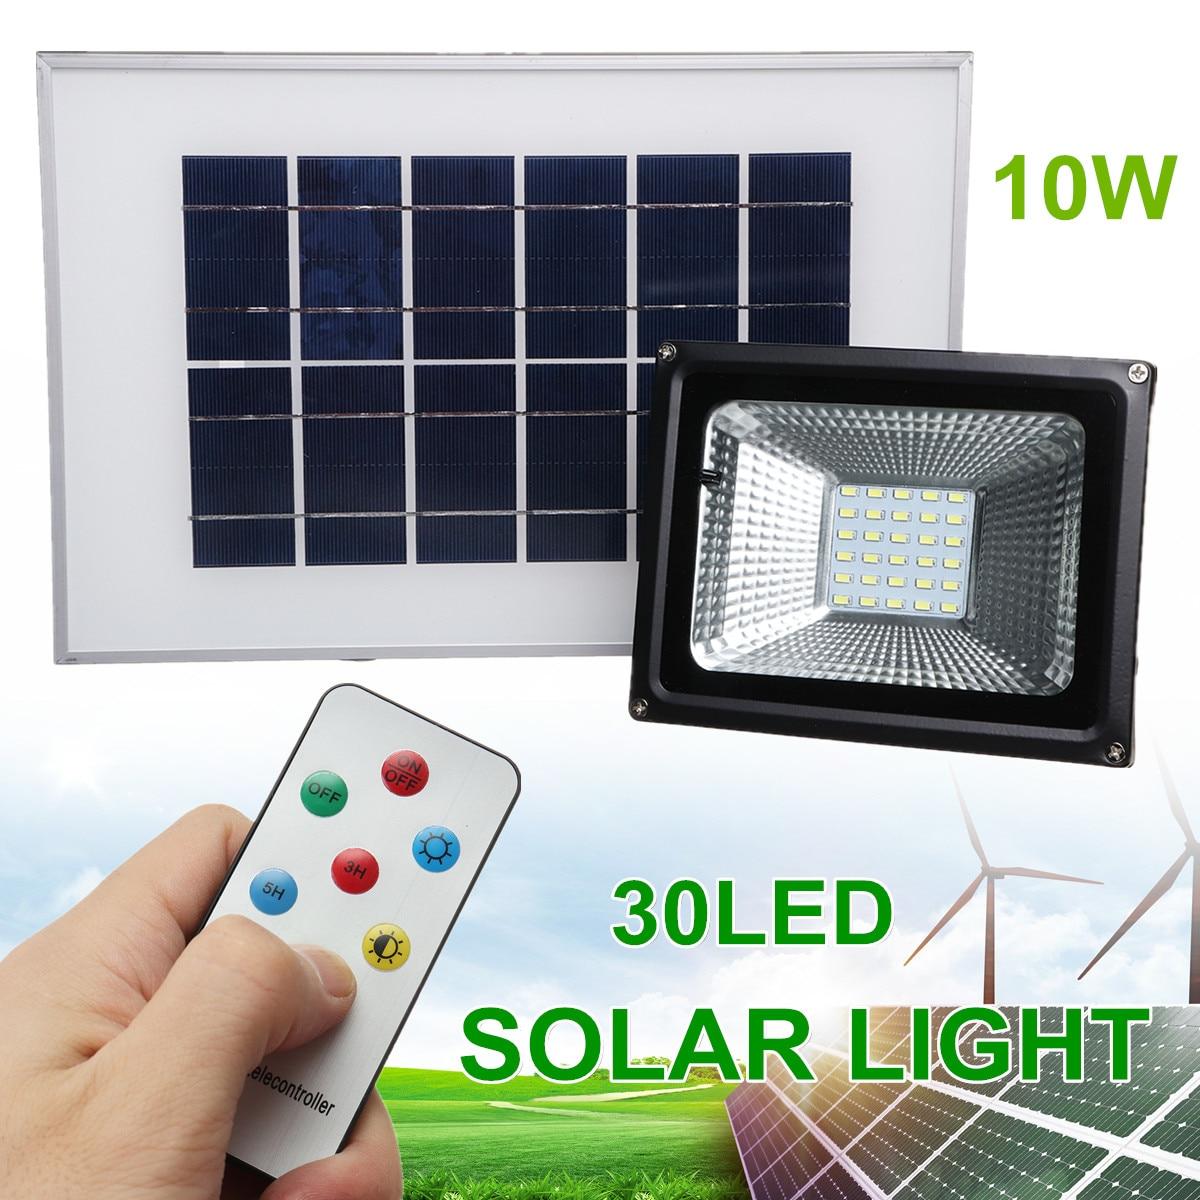 30 LED Solar Power Flood Light Remote Control Outdoor Garden Lawn Lighting Lamp Reusable & Super Bright Intelligent Sunlight цена 2017